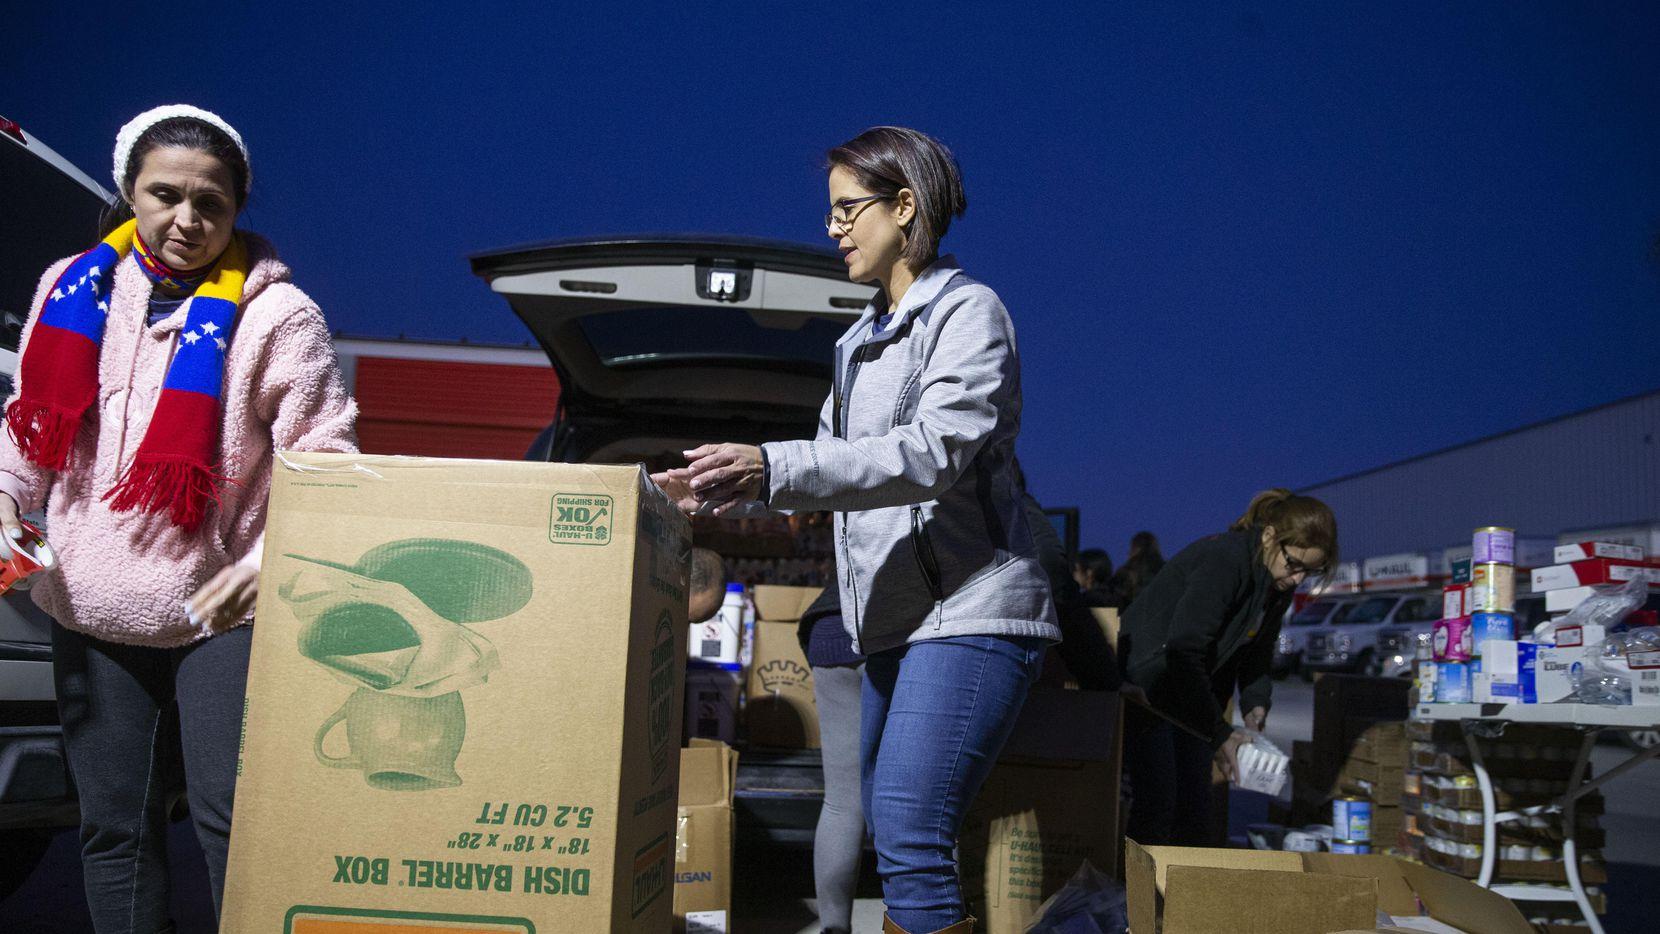 Josibelle Parry (izq.) y Rebecca Domínguez empacan una caja con productos básicos que son enviados a Venezuela. (DMN/SHABAN ATHUMAN)